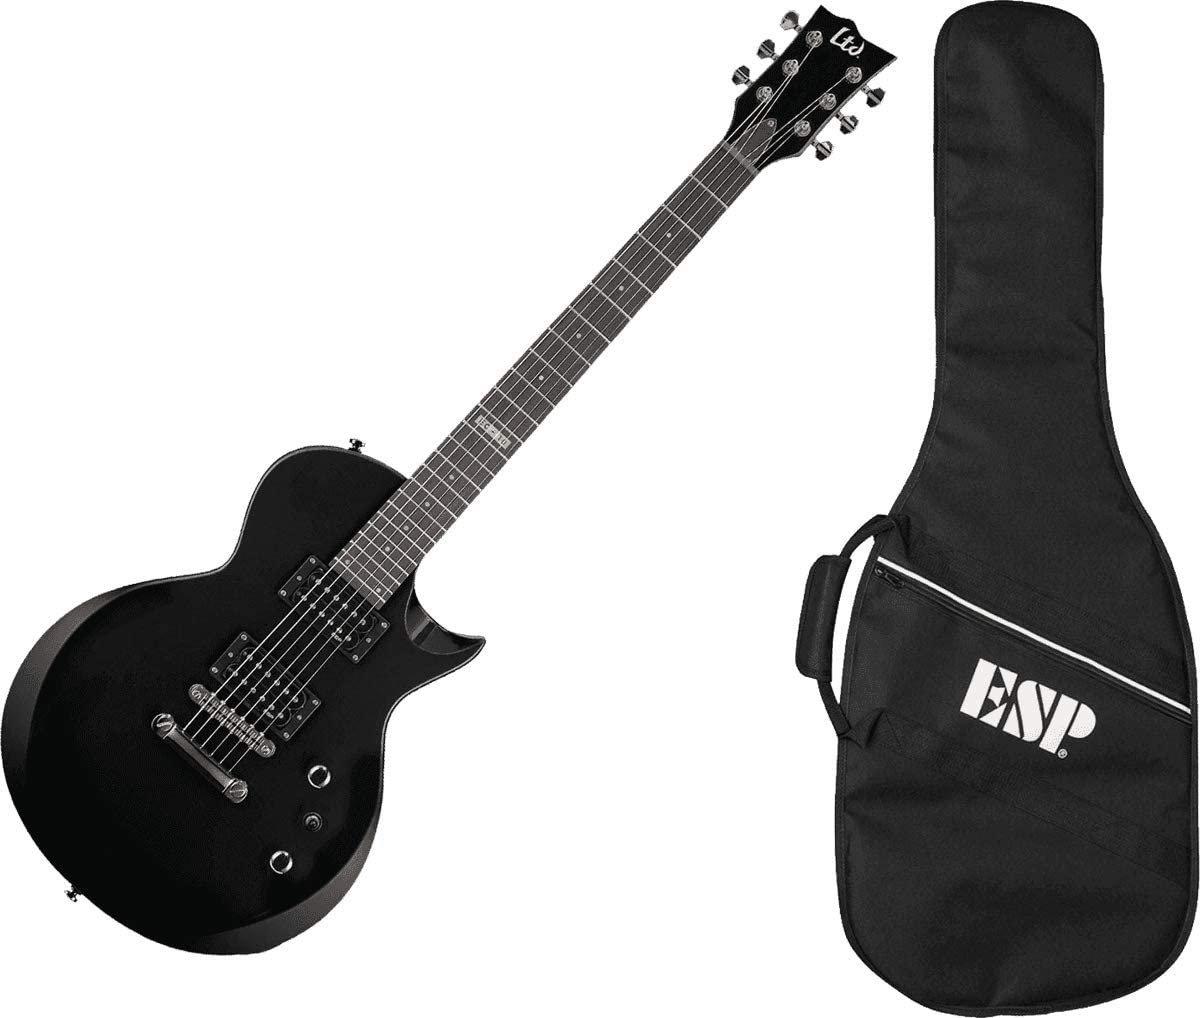 ESP LTD Electric EC-10, Gig bag included